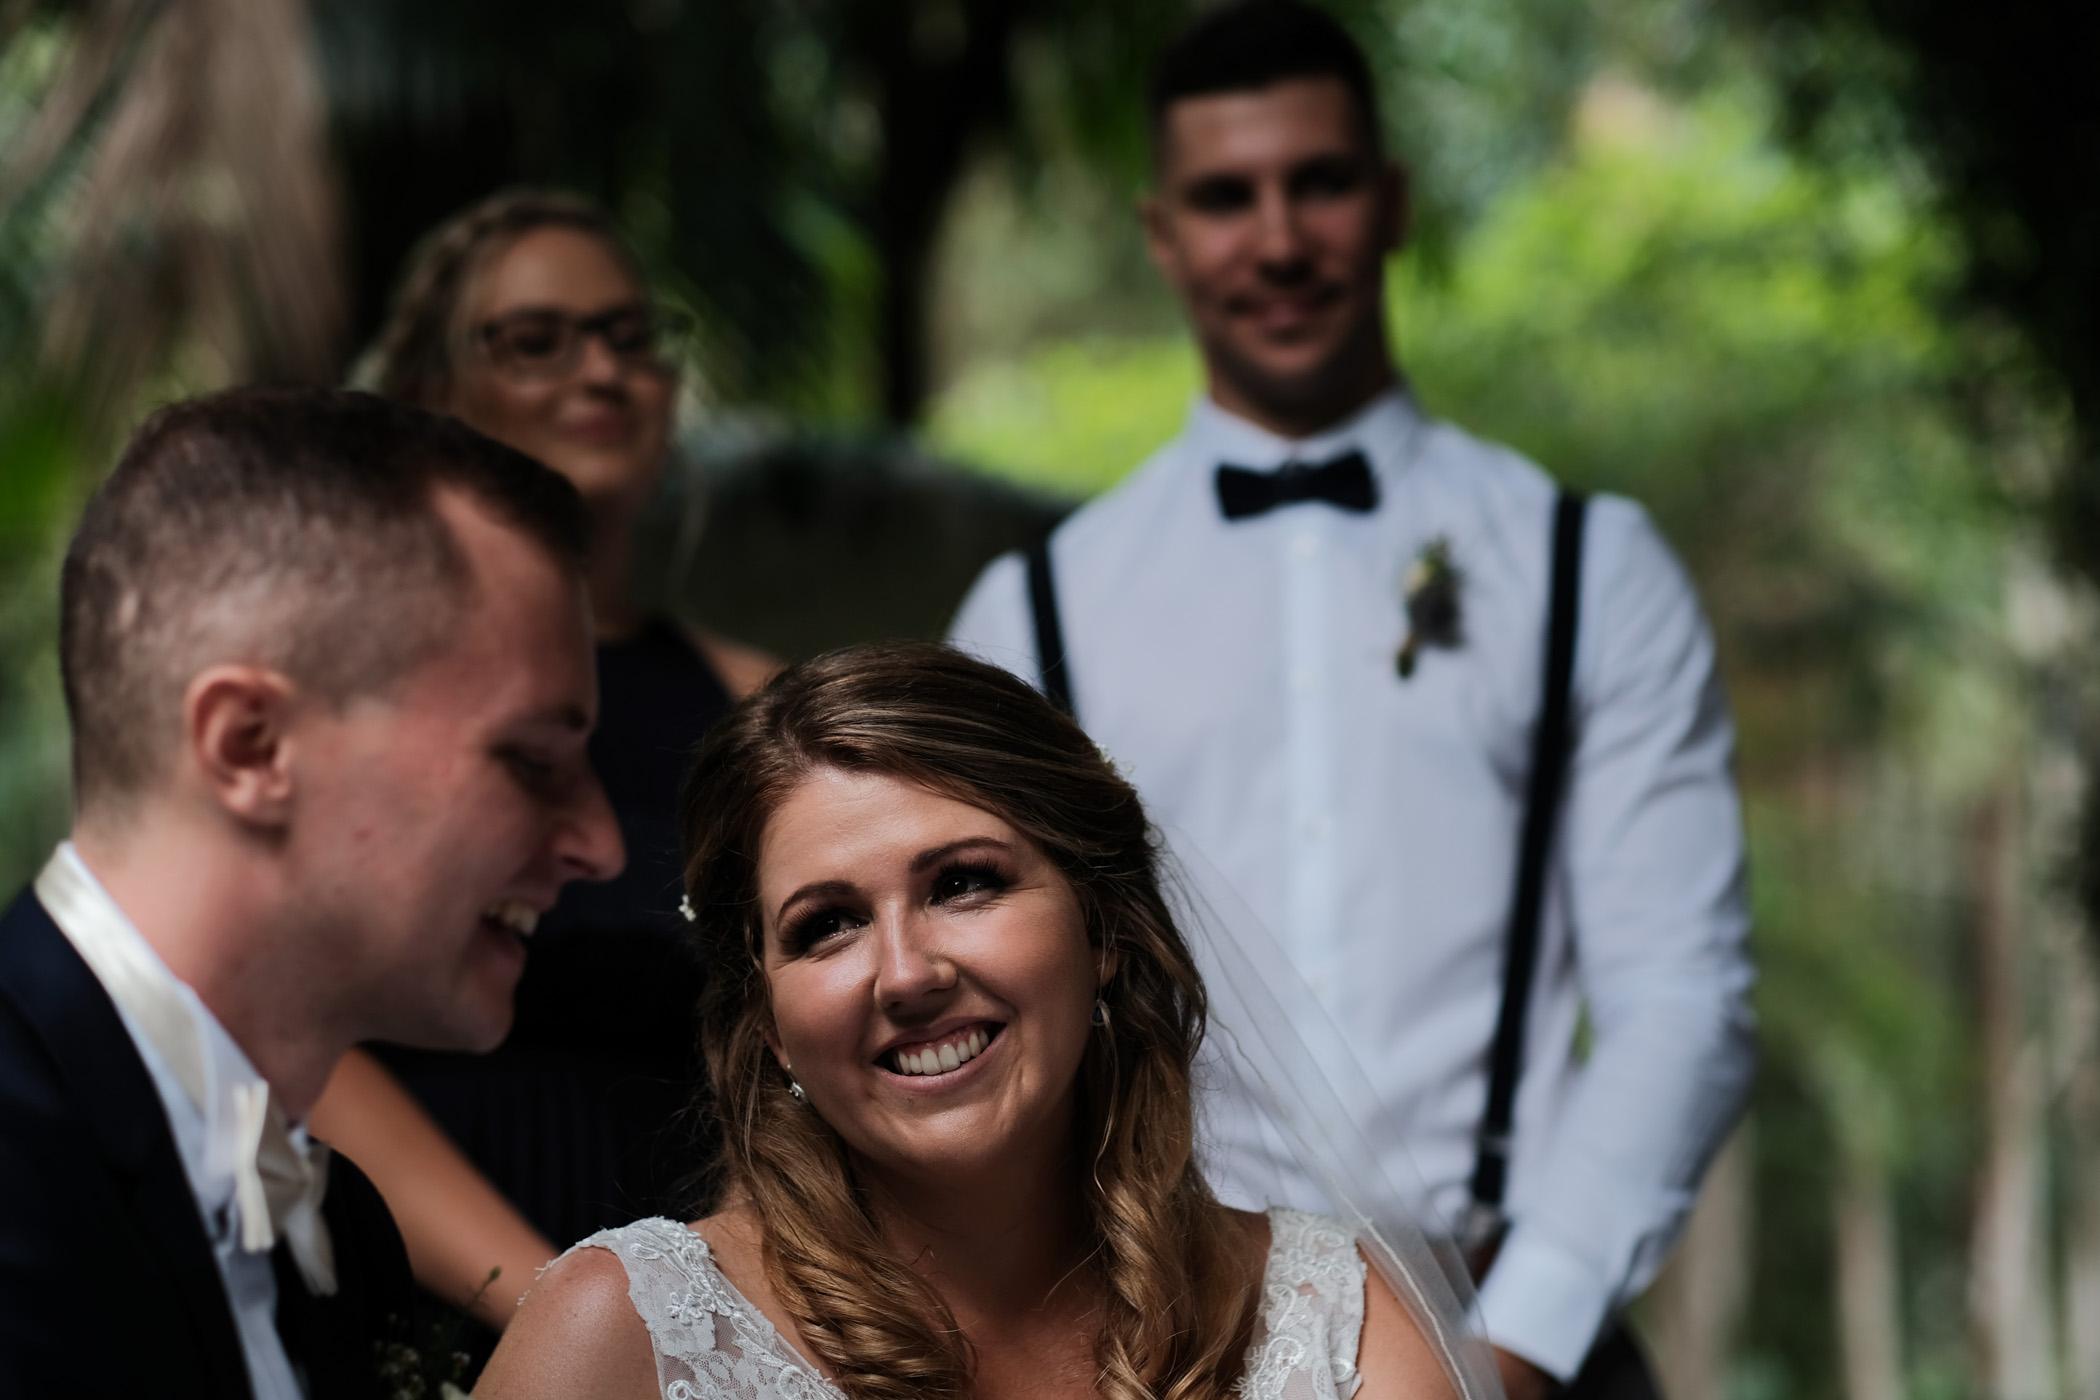 2018.04-Ceder-Creek-lodges-BLOG-Wedding-Web-Res_Leisure-Lane-Photo-12.jpg